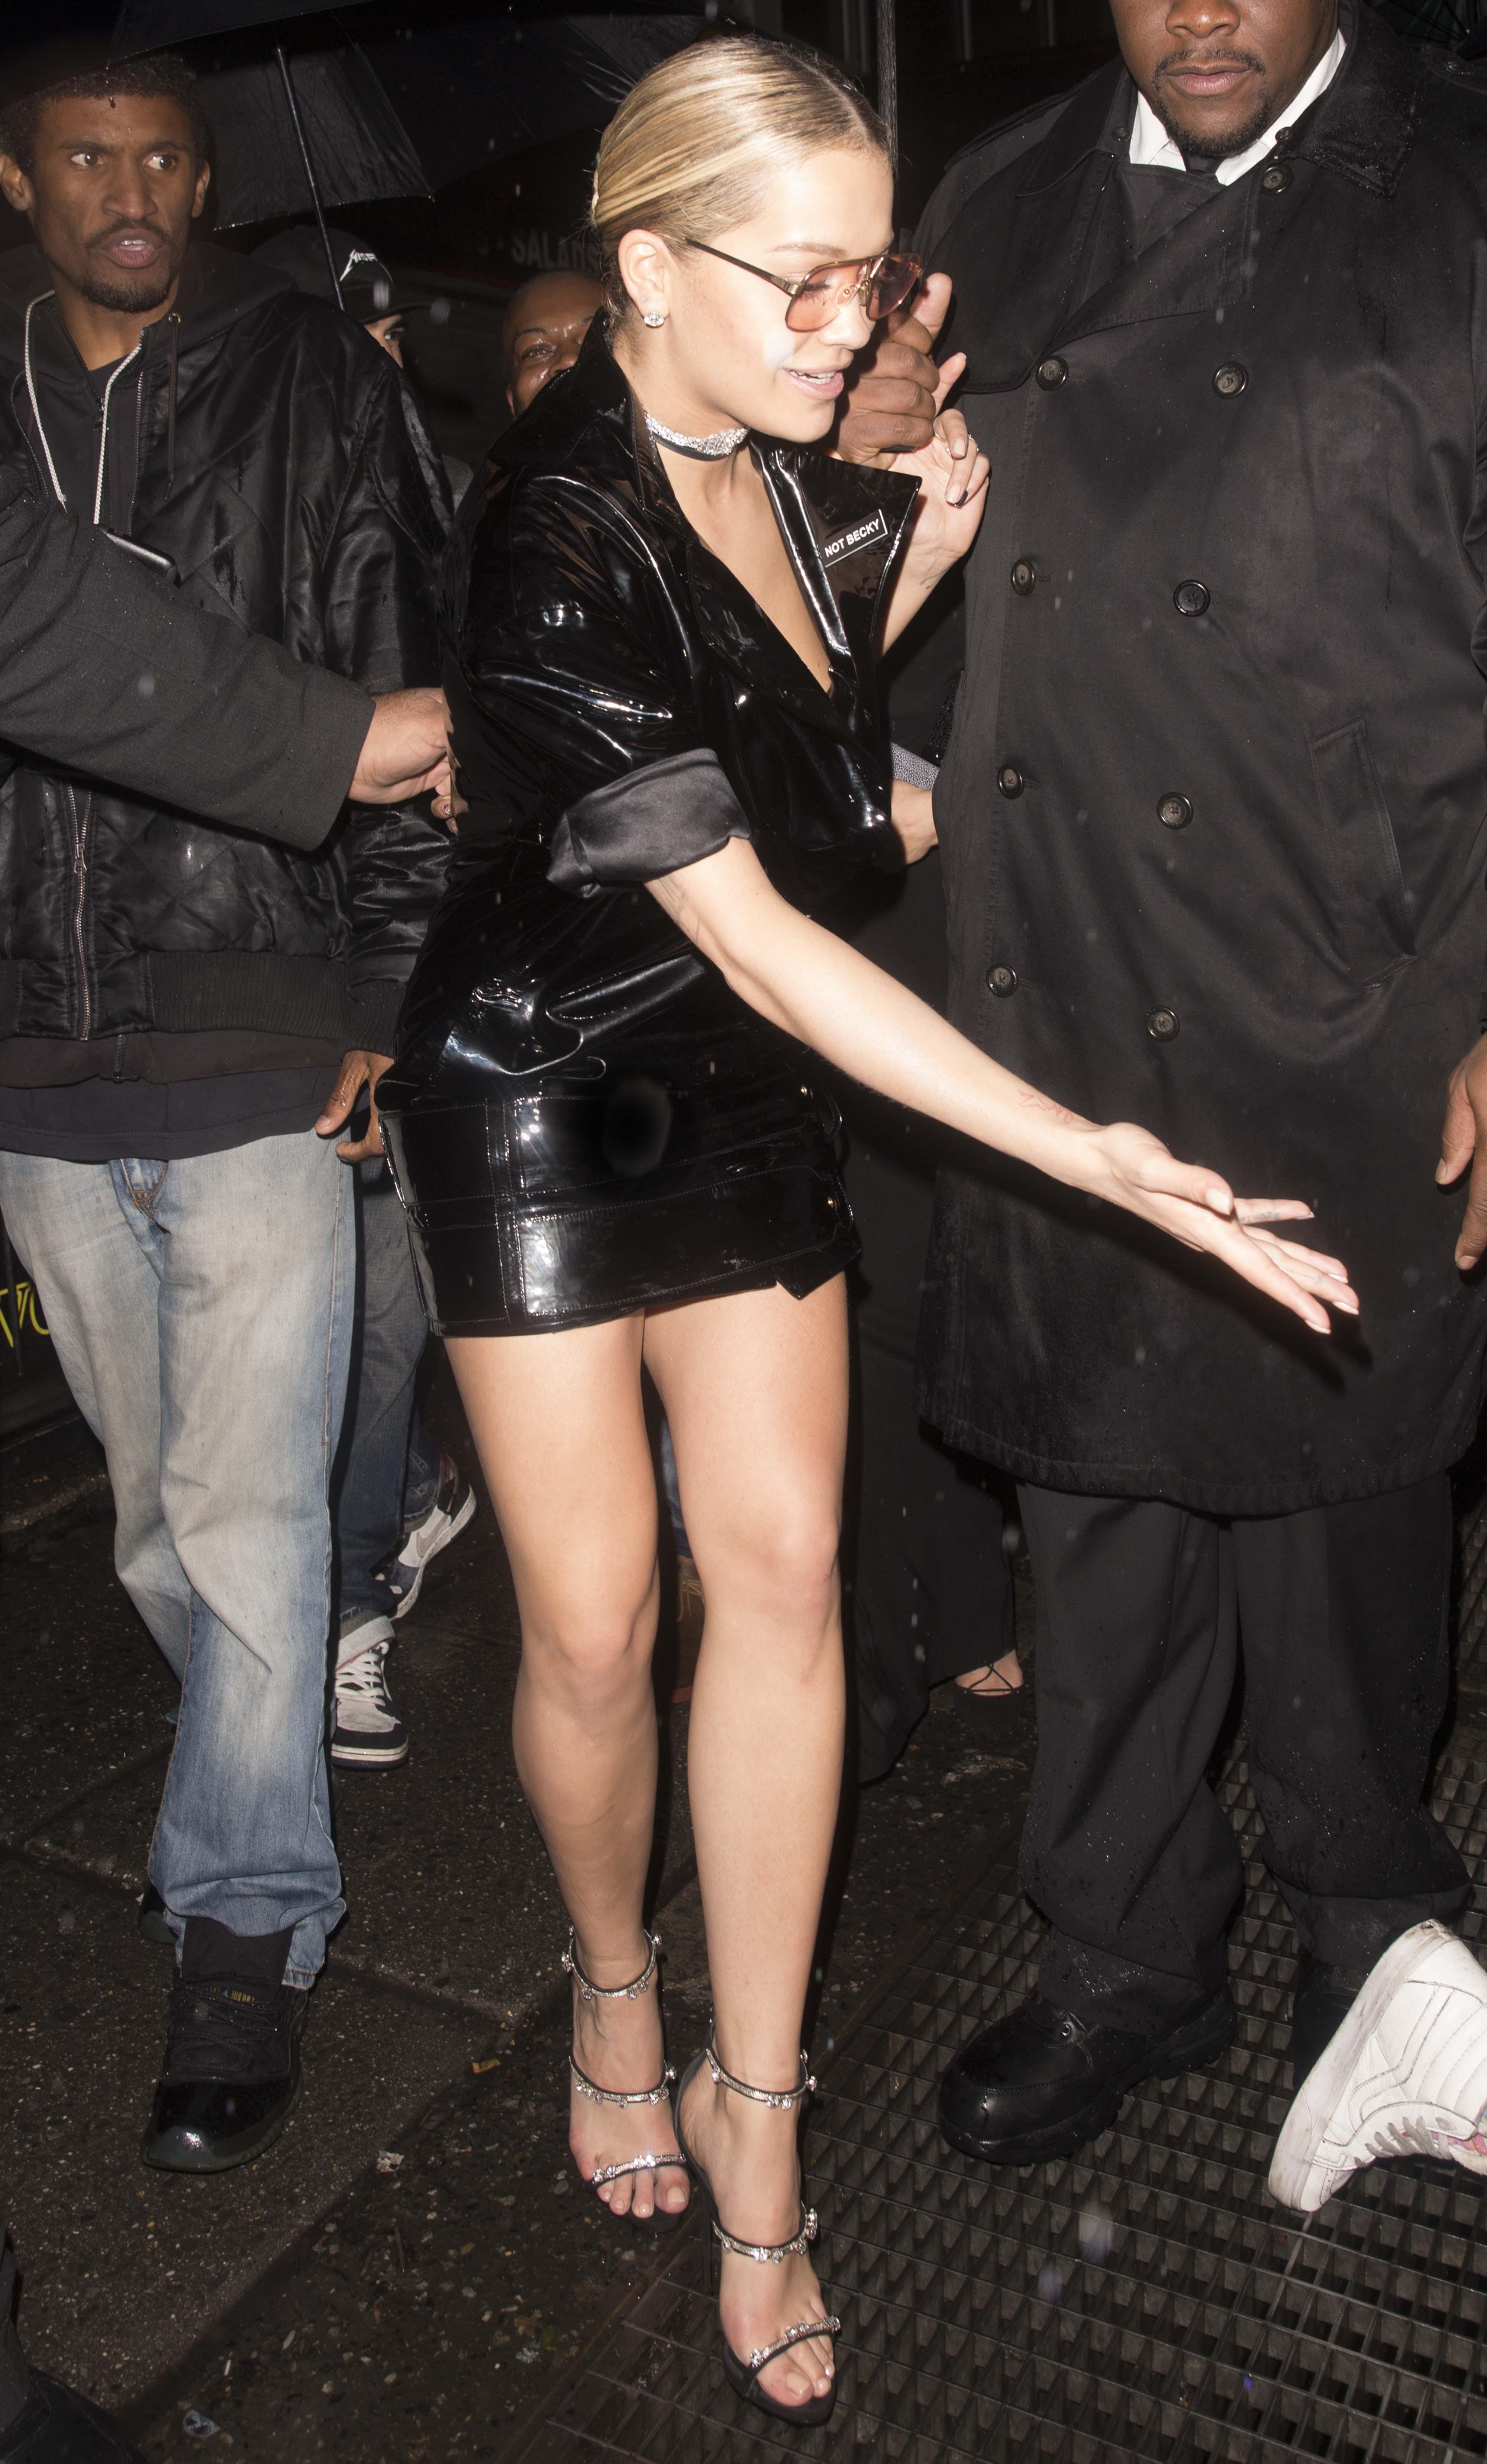 Rita Ora wears 'Not Becky' badge after Met Gala